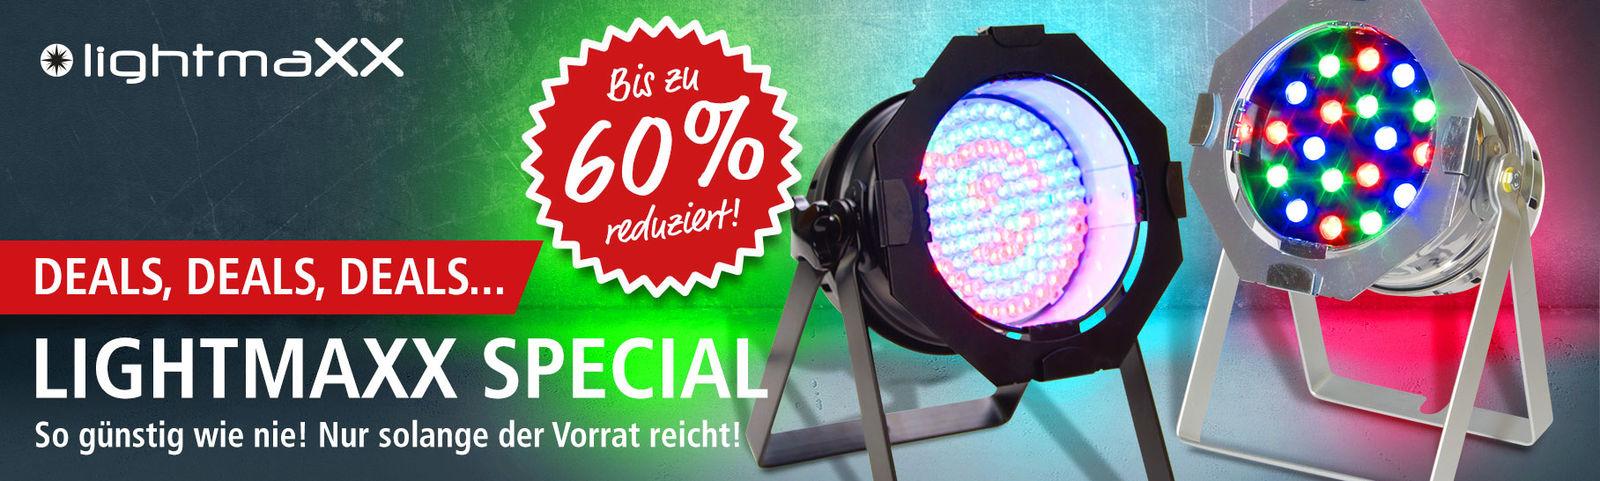 lightmaXX Special Deals